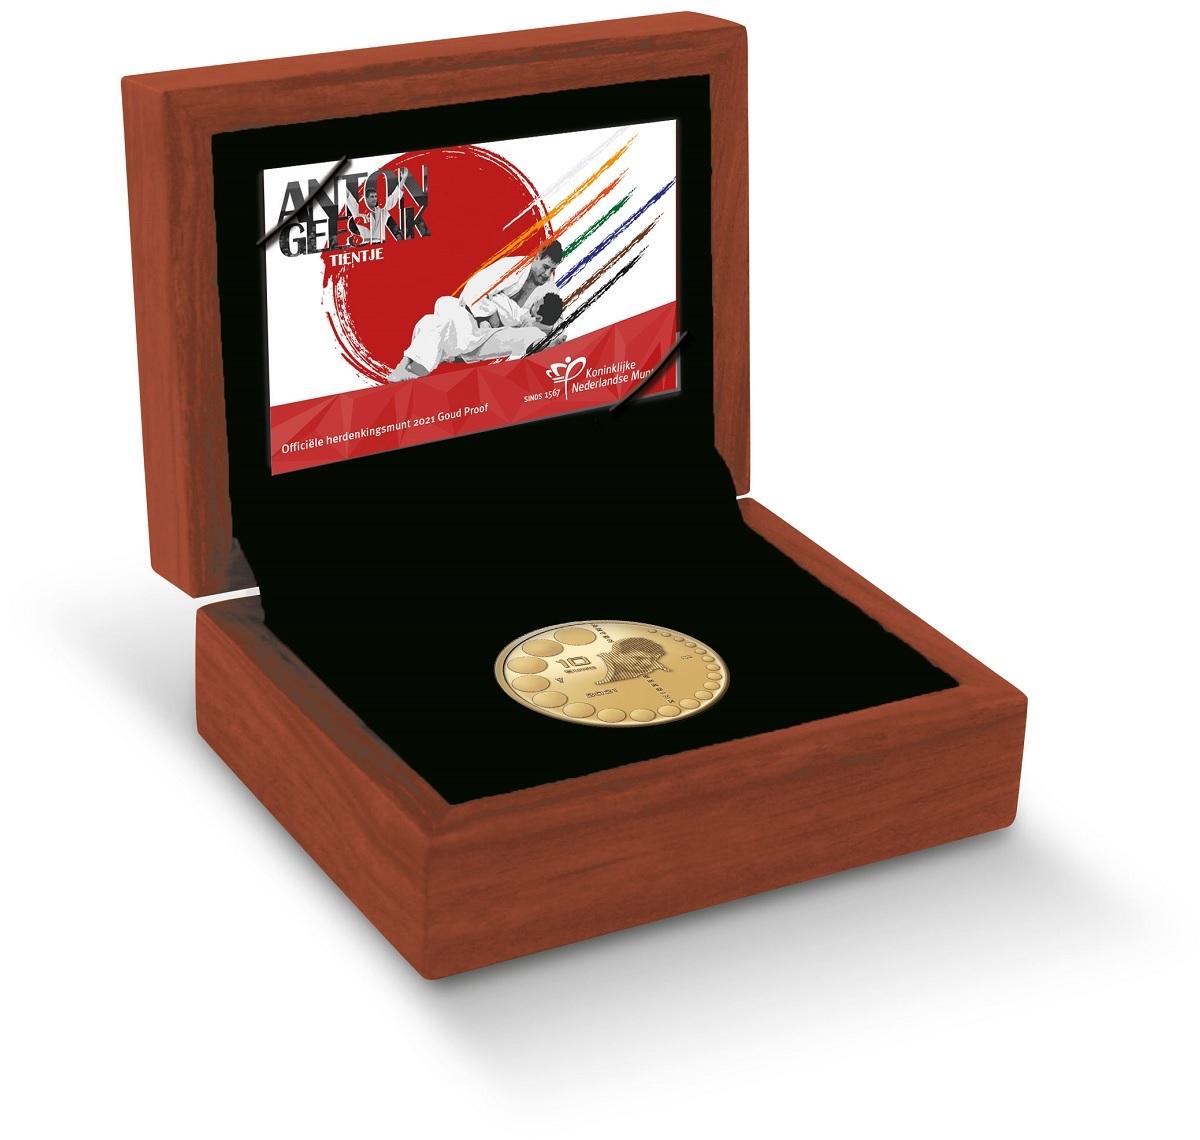 (EUR14.Proof.2021.0110995) 10 euro Netherlands 2021 Proof gold - Anton Geesink (case) (zoom)